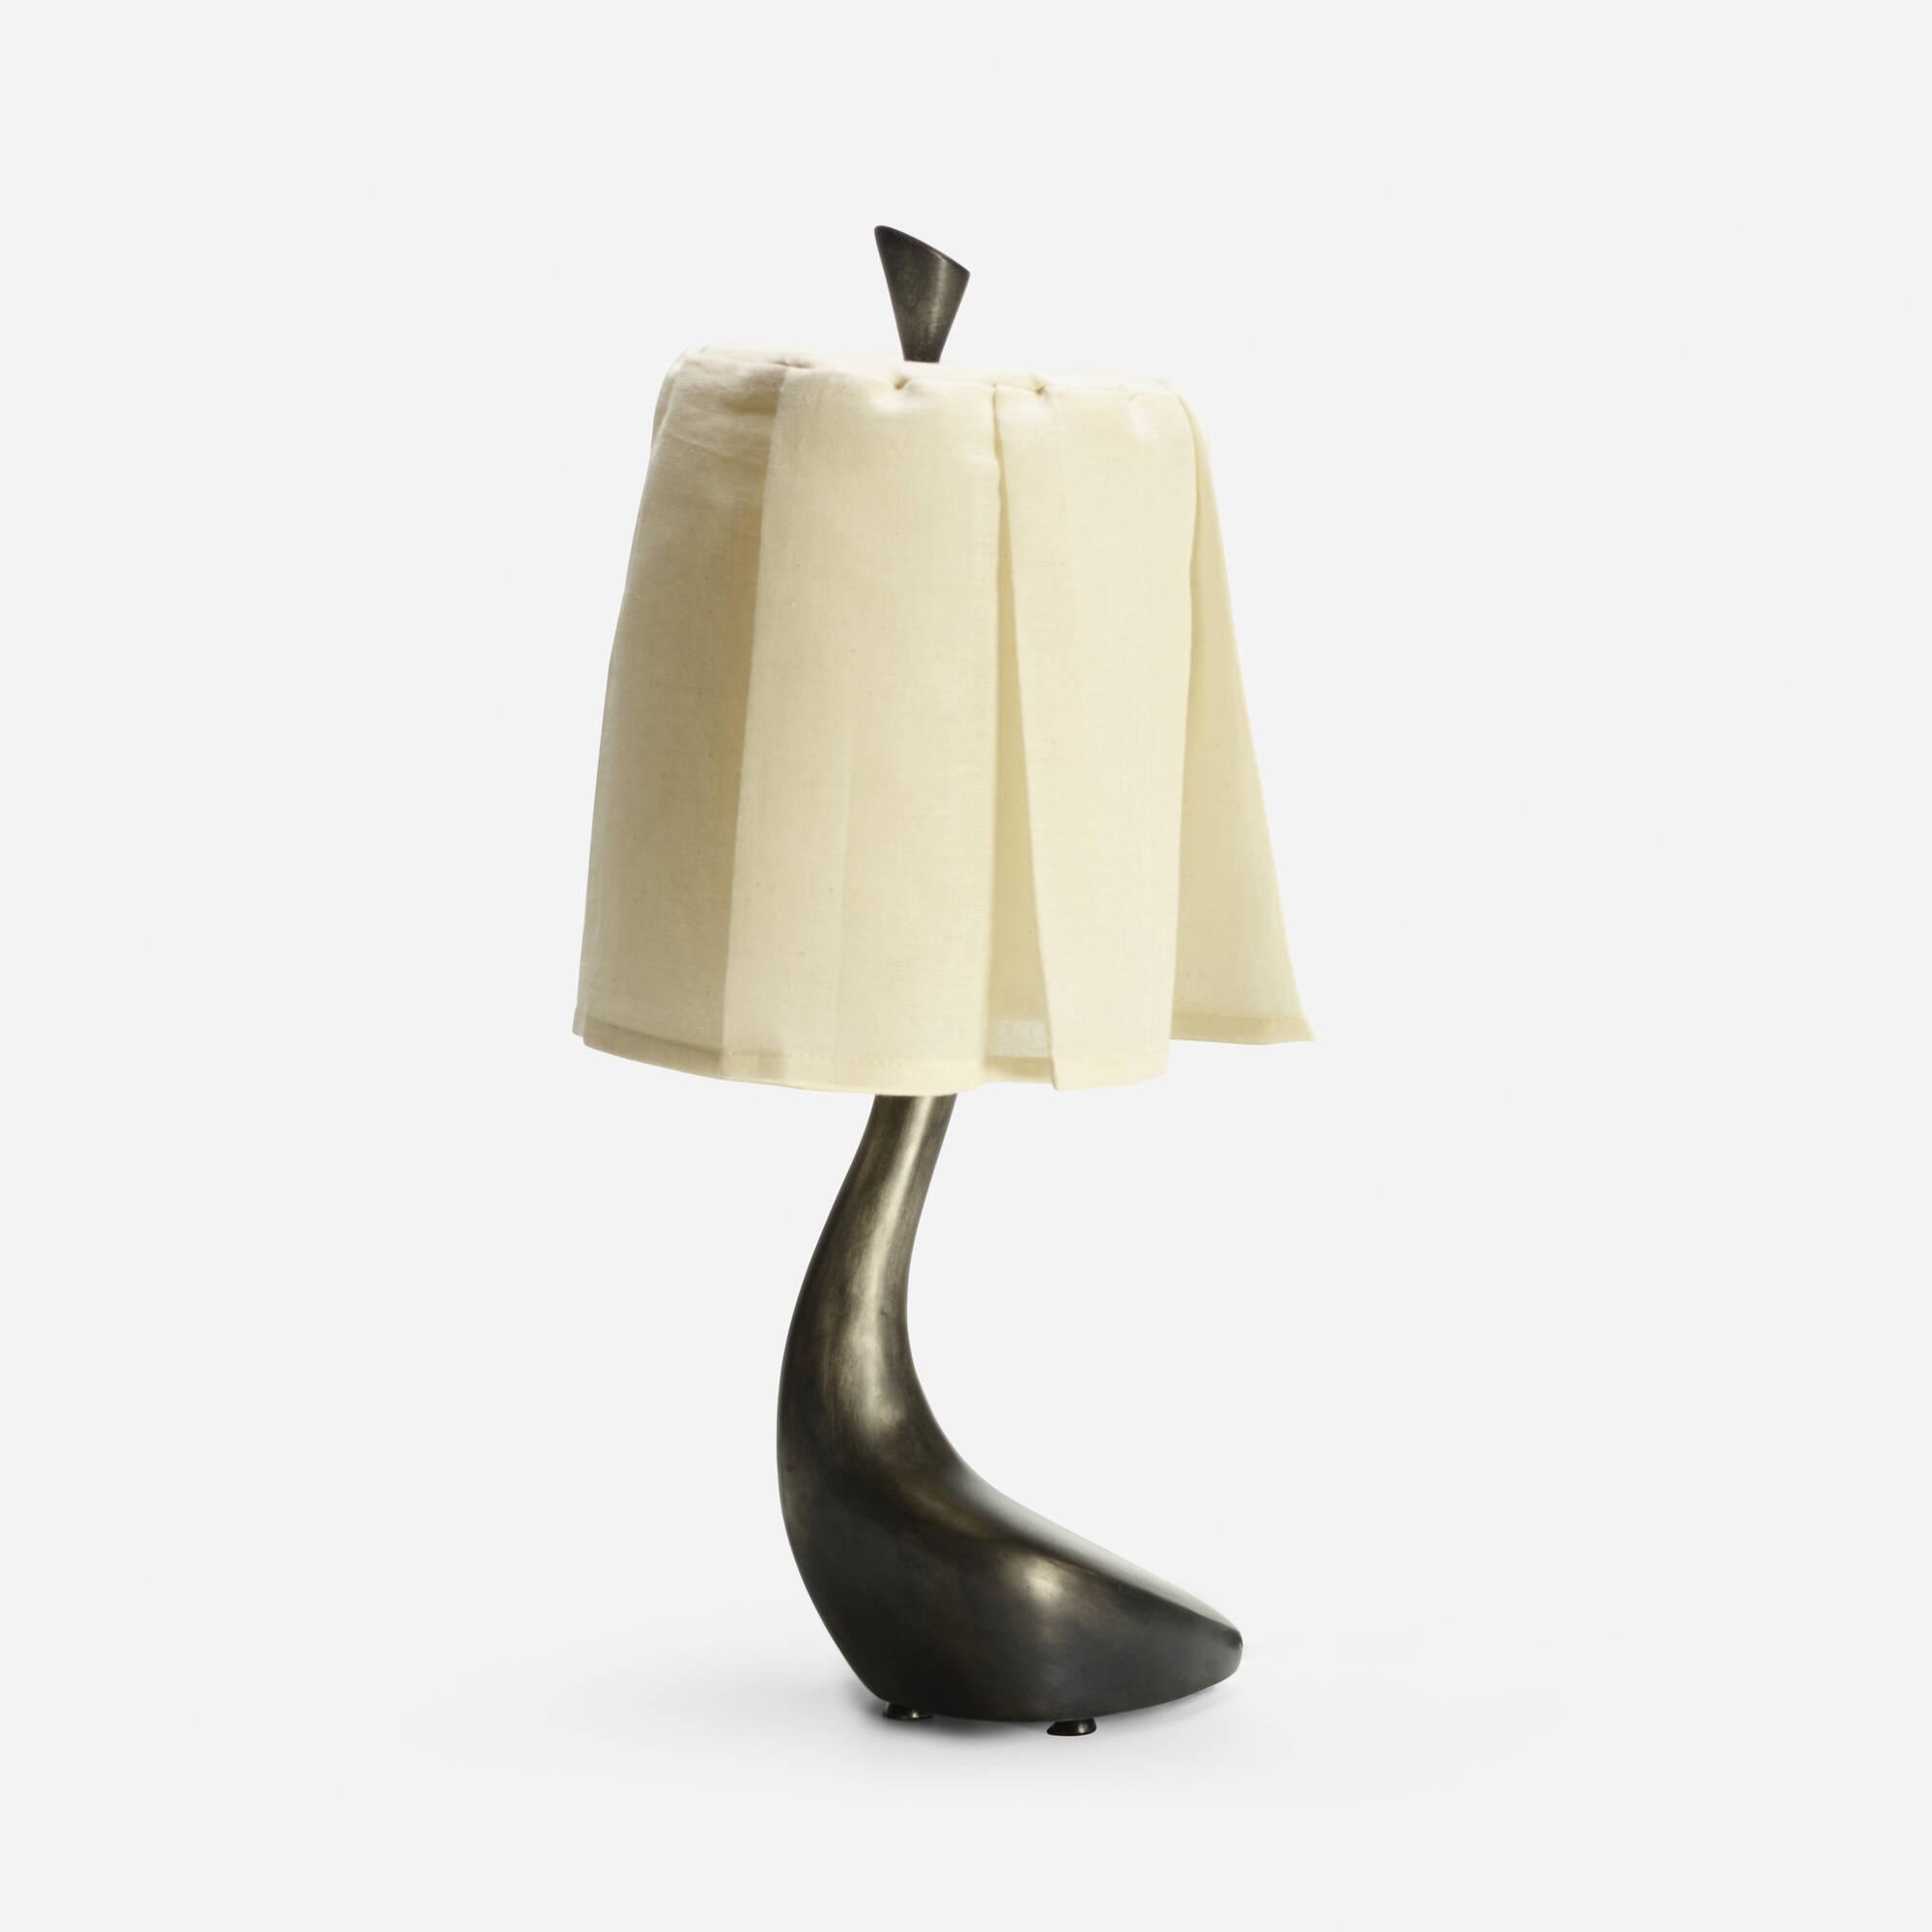 188: Jordan Mozer / prototype Hudson Club table lamp (1 of 2)